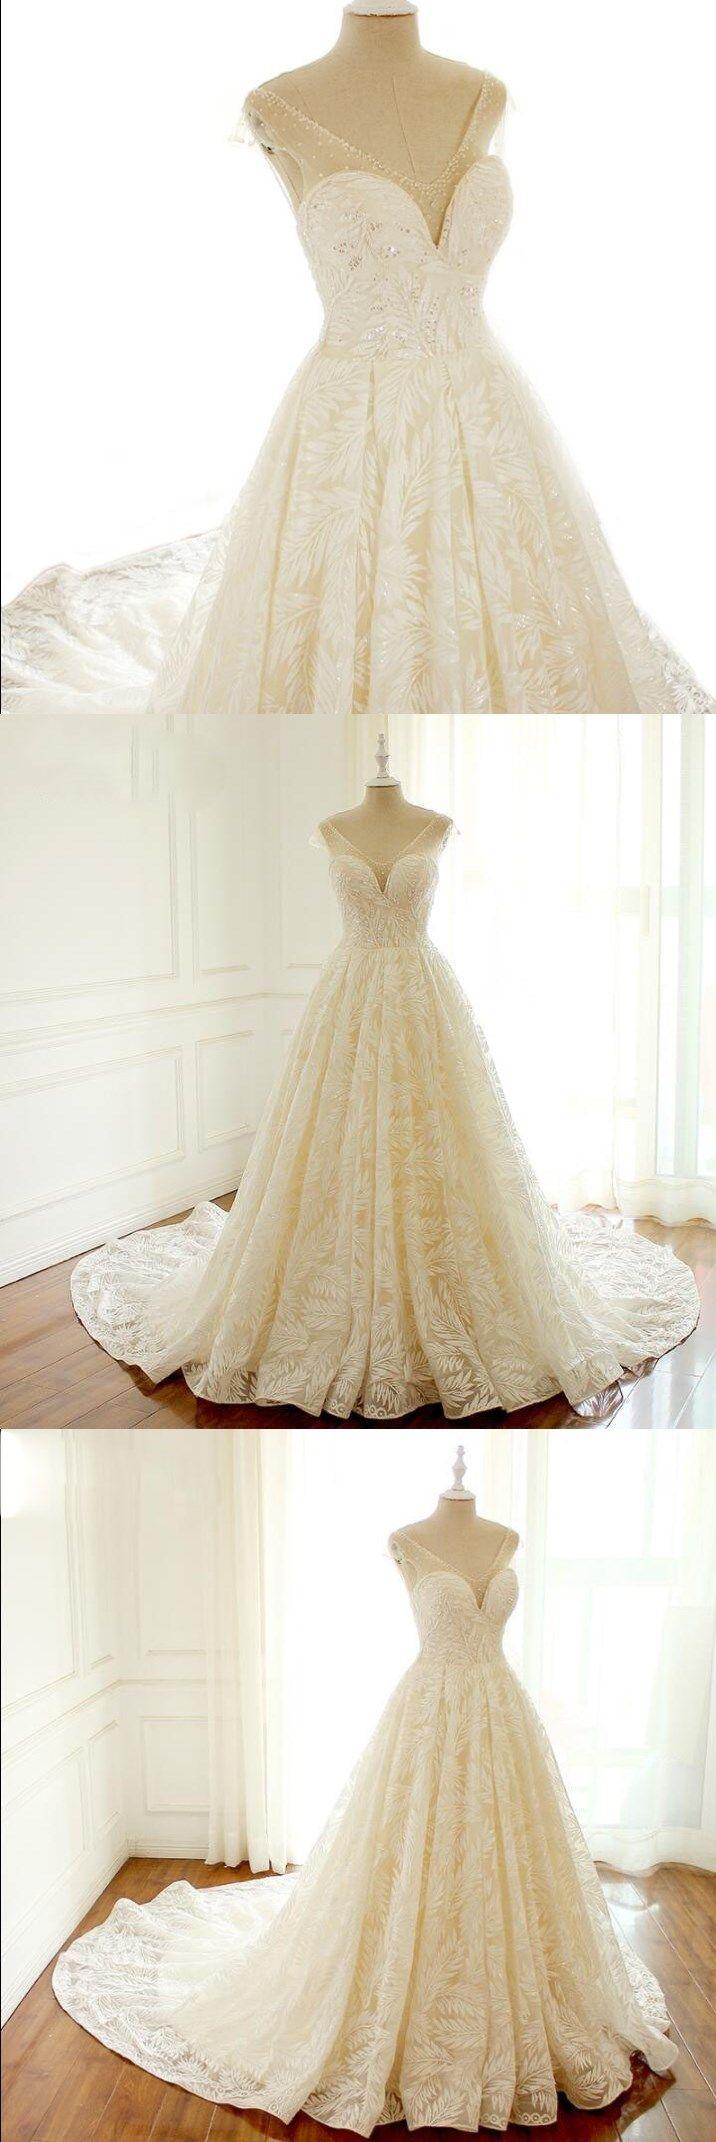 V neck unique new design wedding dresses lovely romantic long